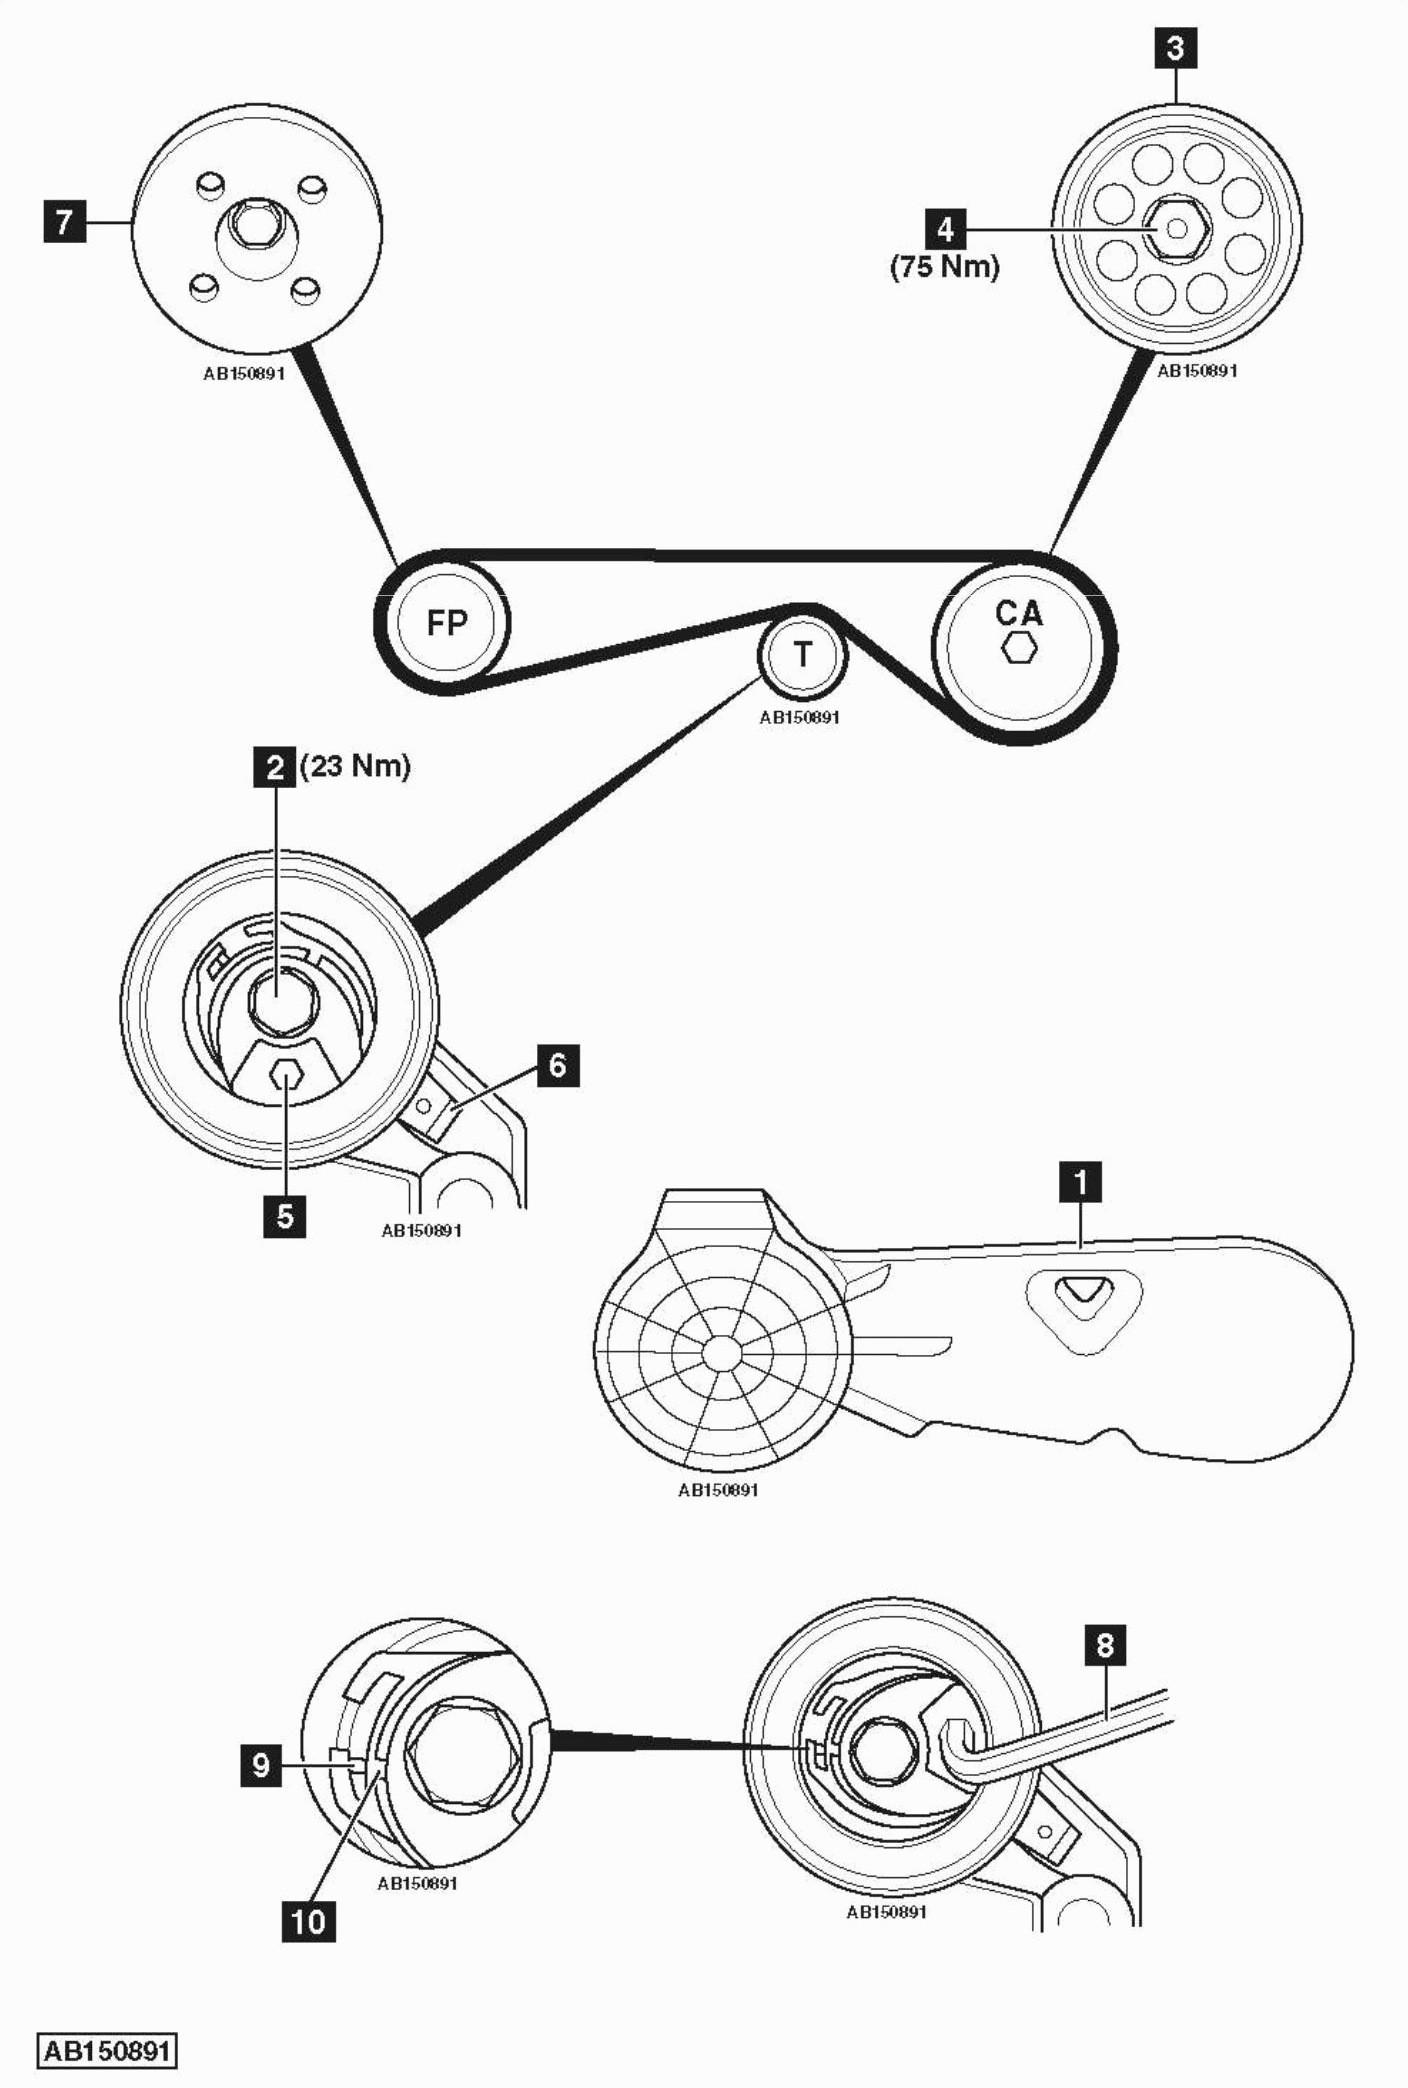 2001 Honda Accord Engine Diagram 2009 Honda Accord Timing